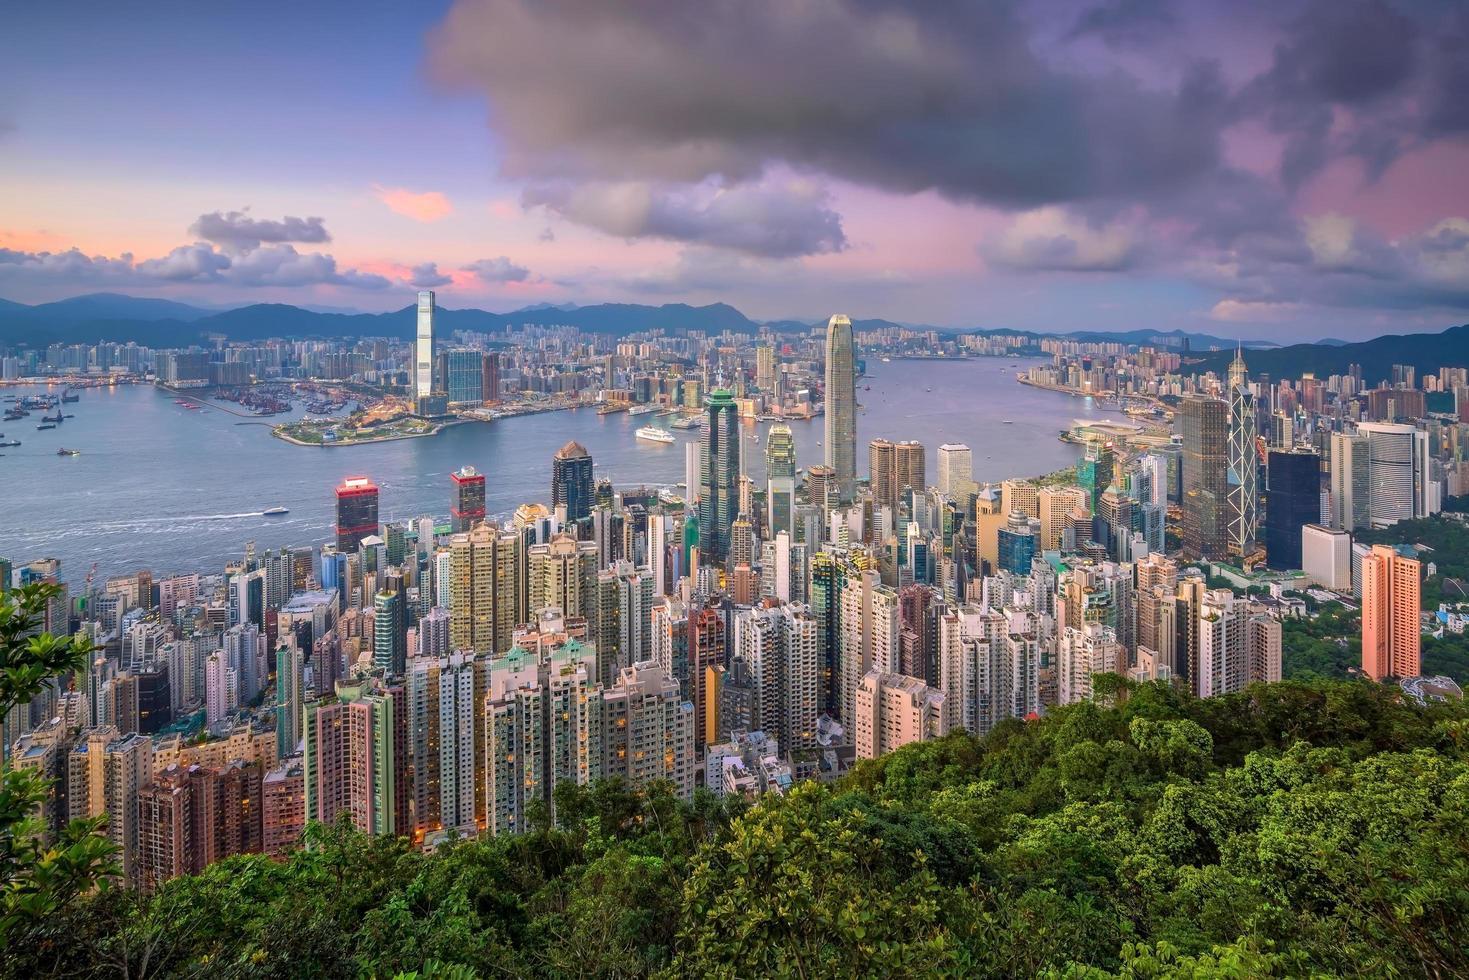 Victoria Harbor in Hong Kong foto